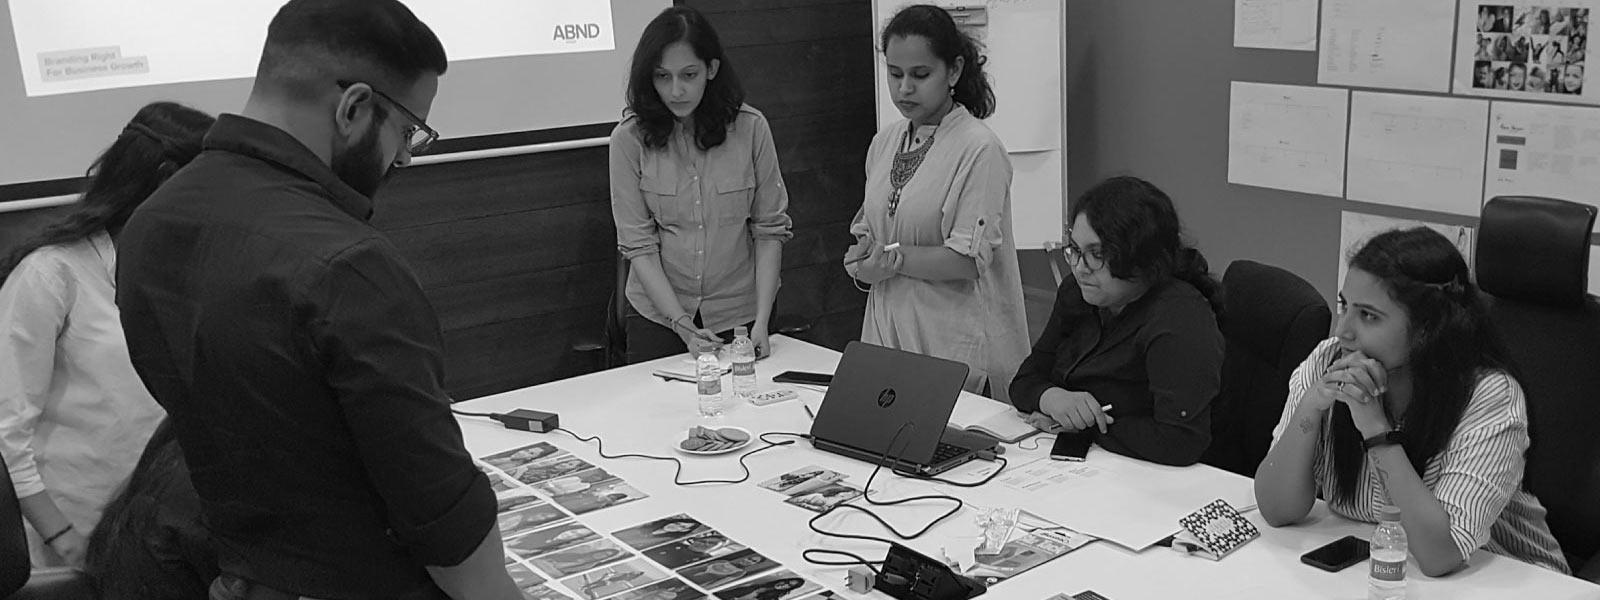 ABND Branding Consultants